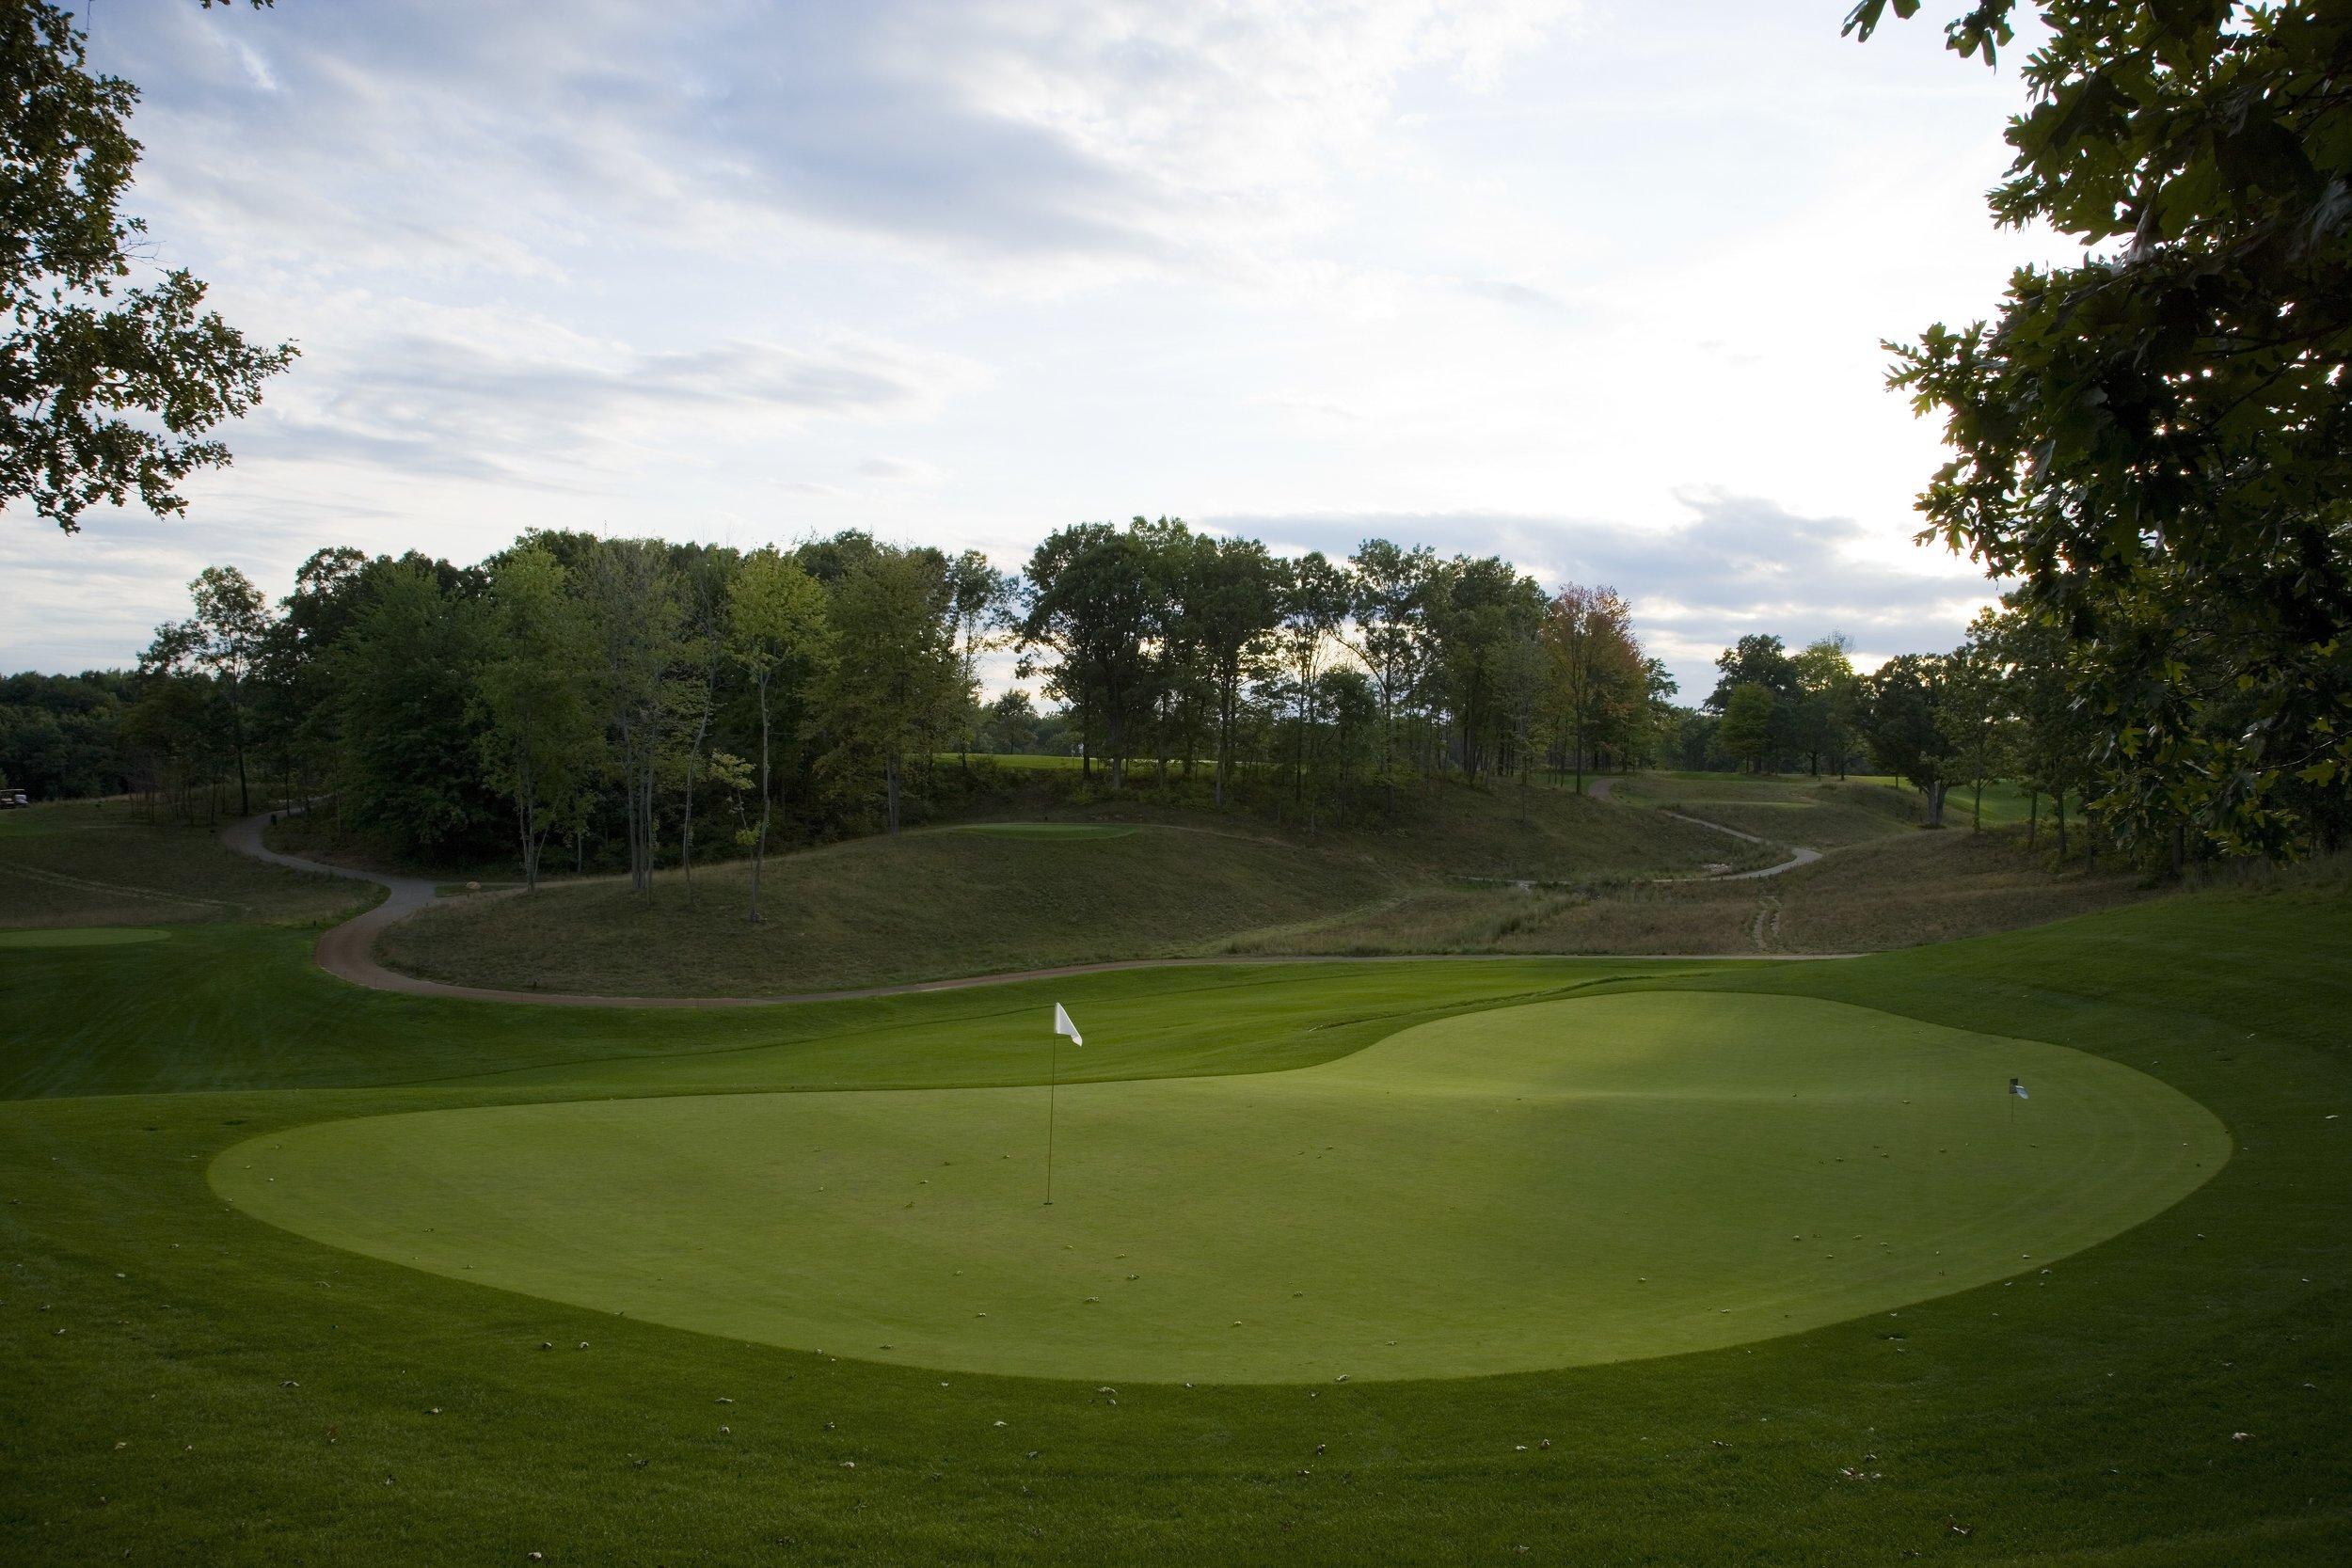 Mines Golf Course / Hole 11